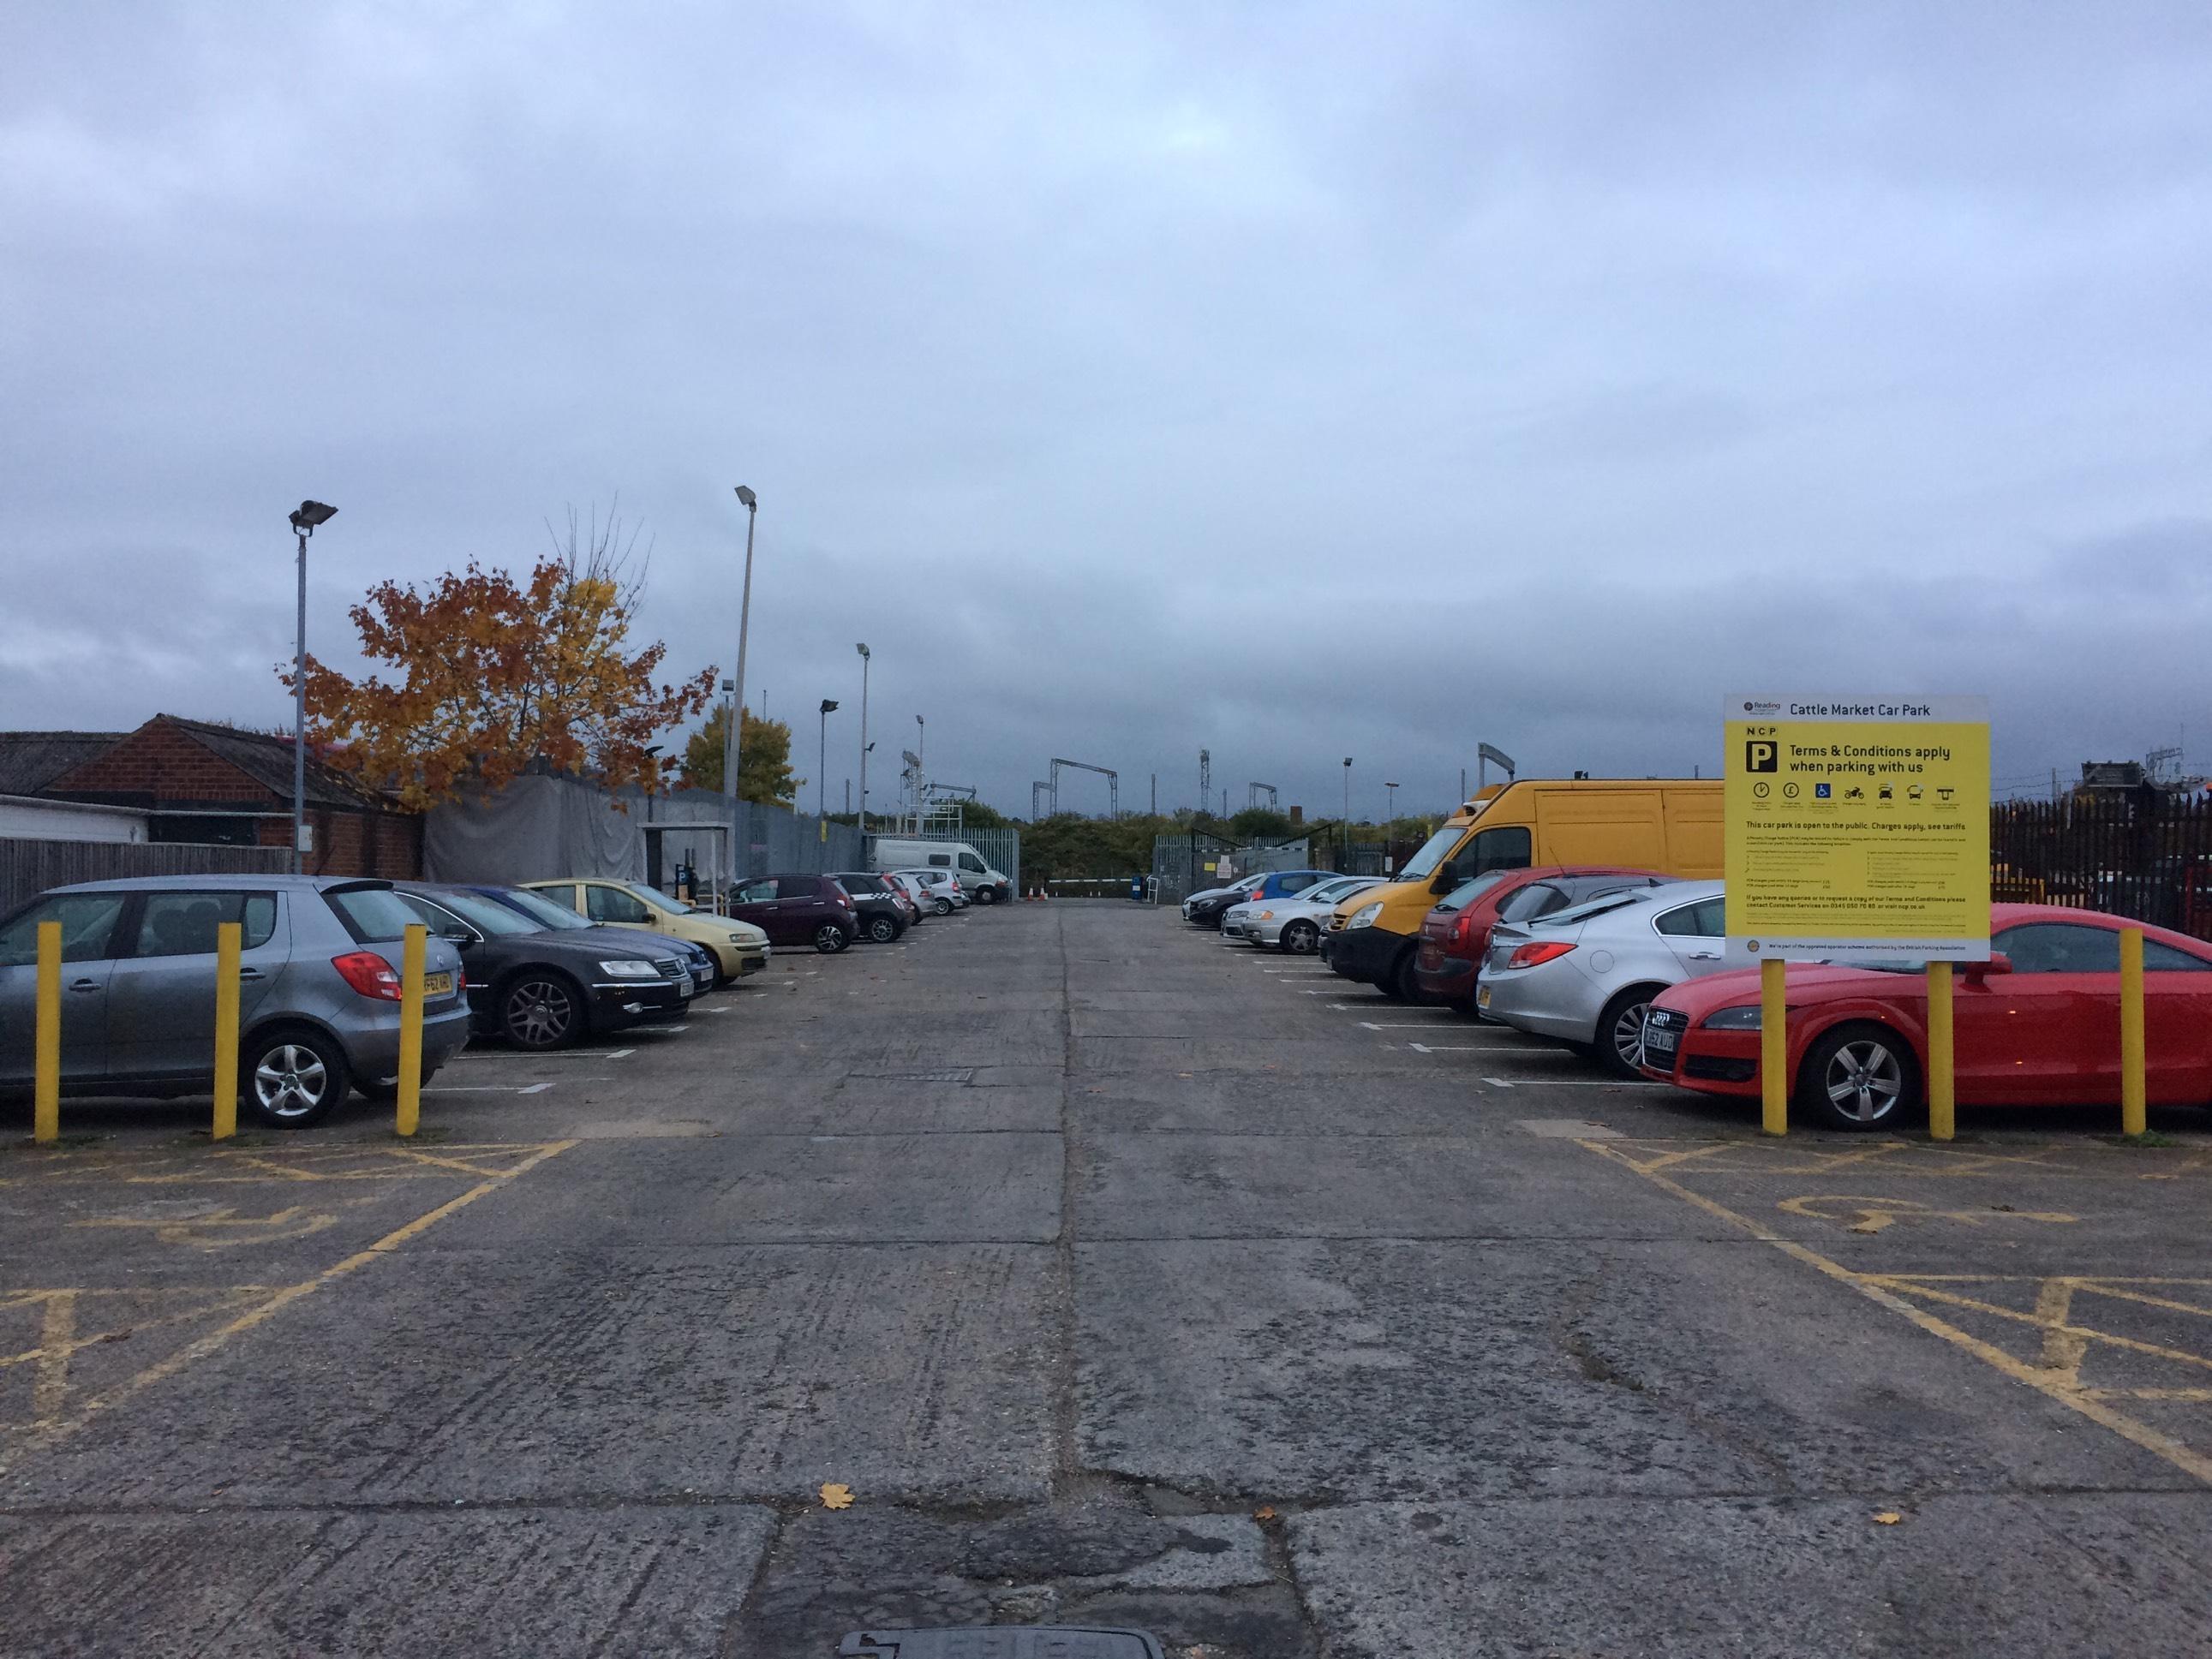 Cattle Market Parking In Reading ParkMe - Us open parking lot map